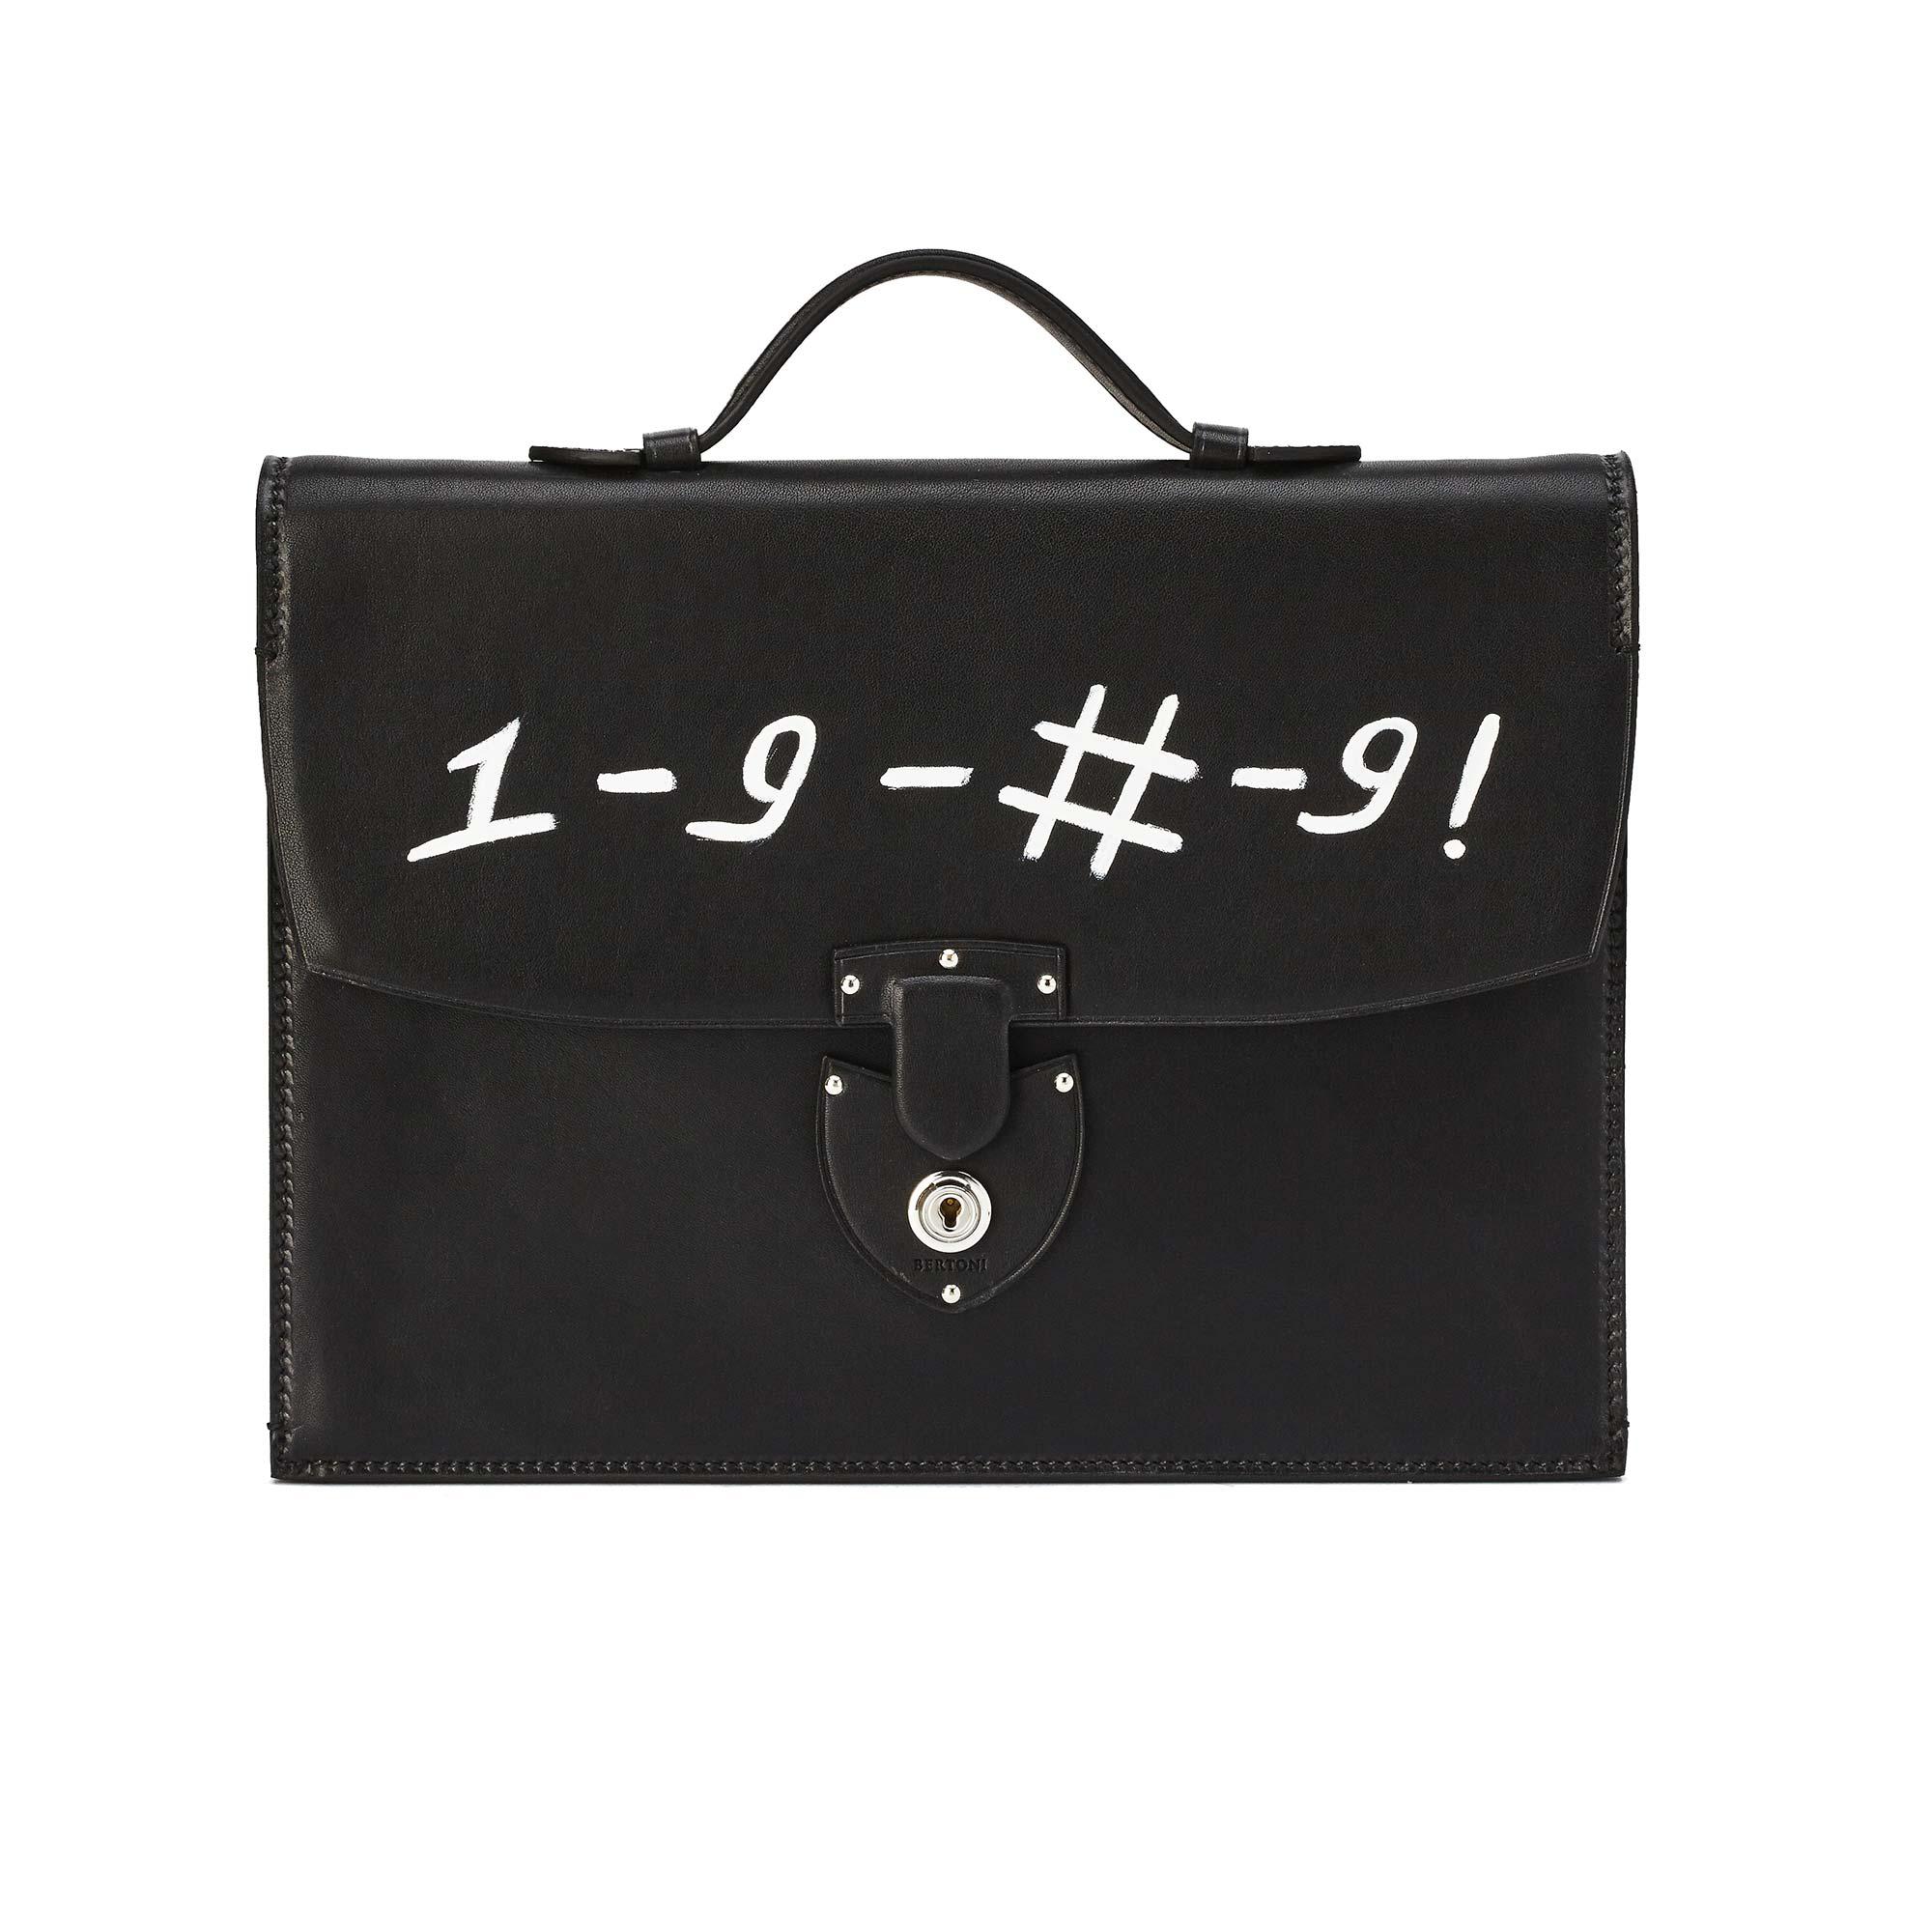 Signature-Biker-black-rock-calf-bag-Bertoni-1949